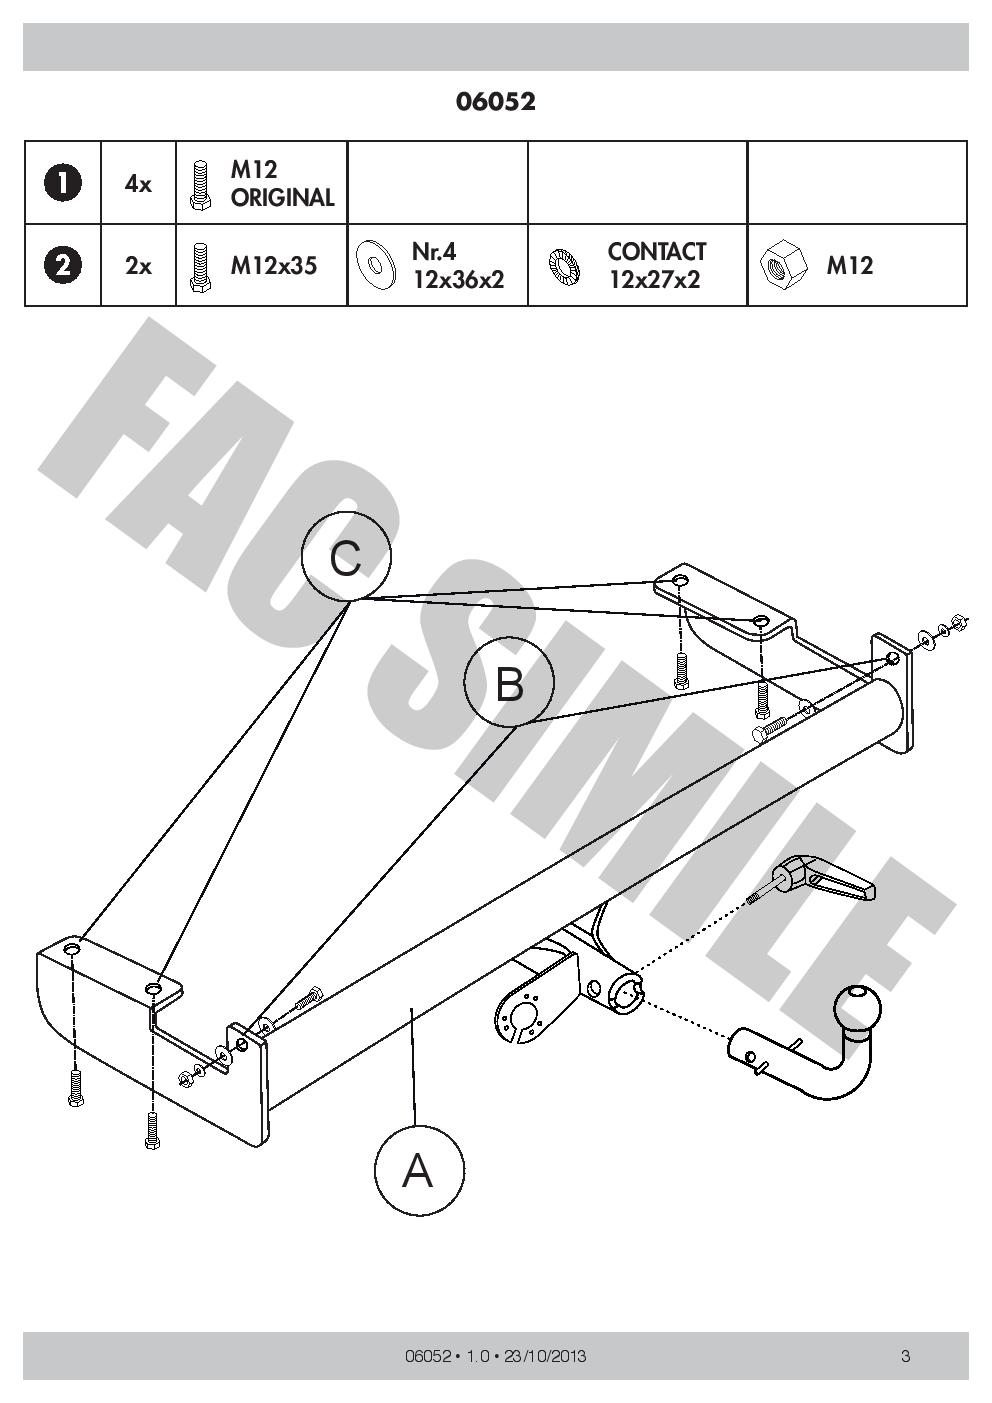 Detachable Towbar 13 Pin Kit C2 Wiring Car Tow Bar For Chrysler Grand Voyager